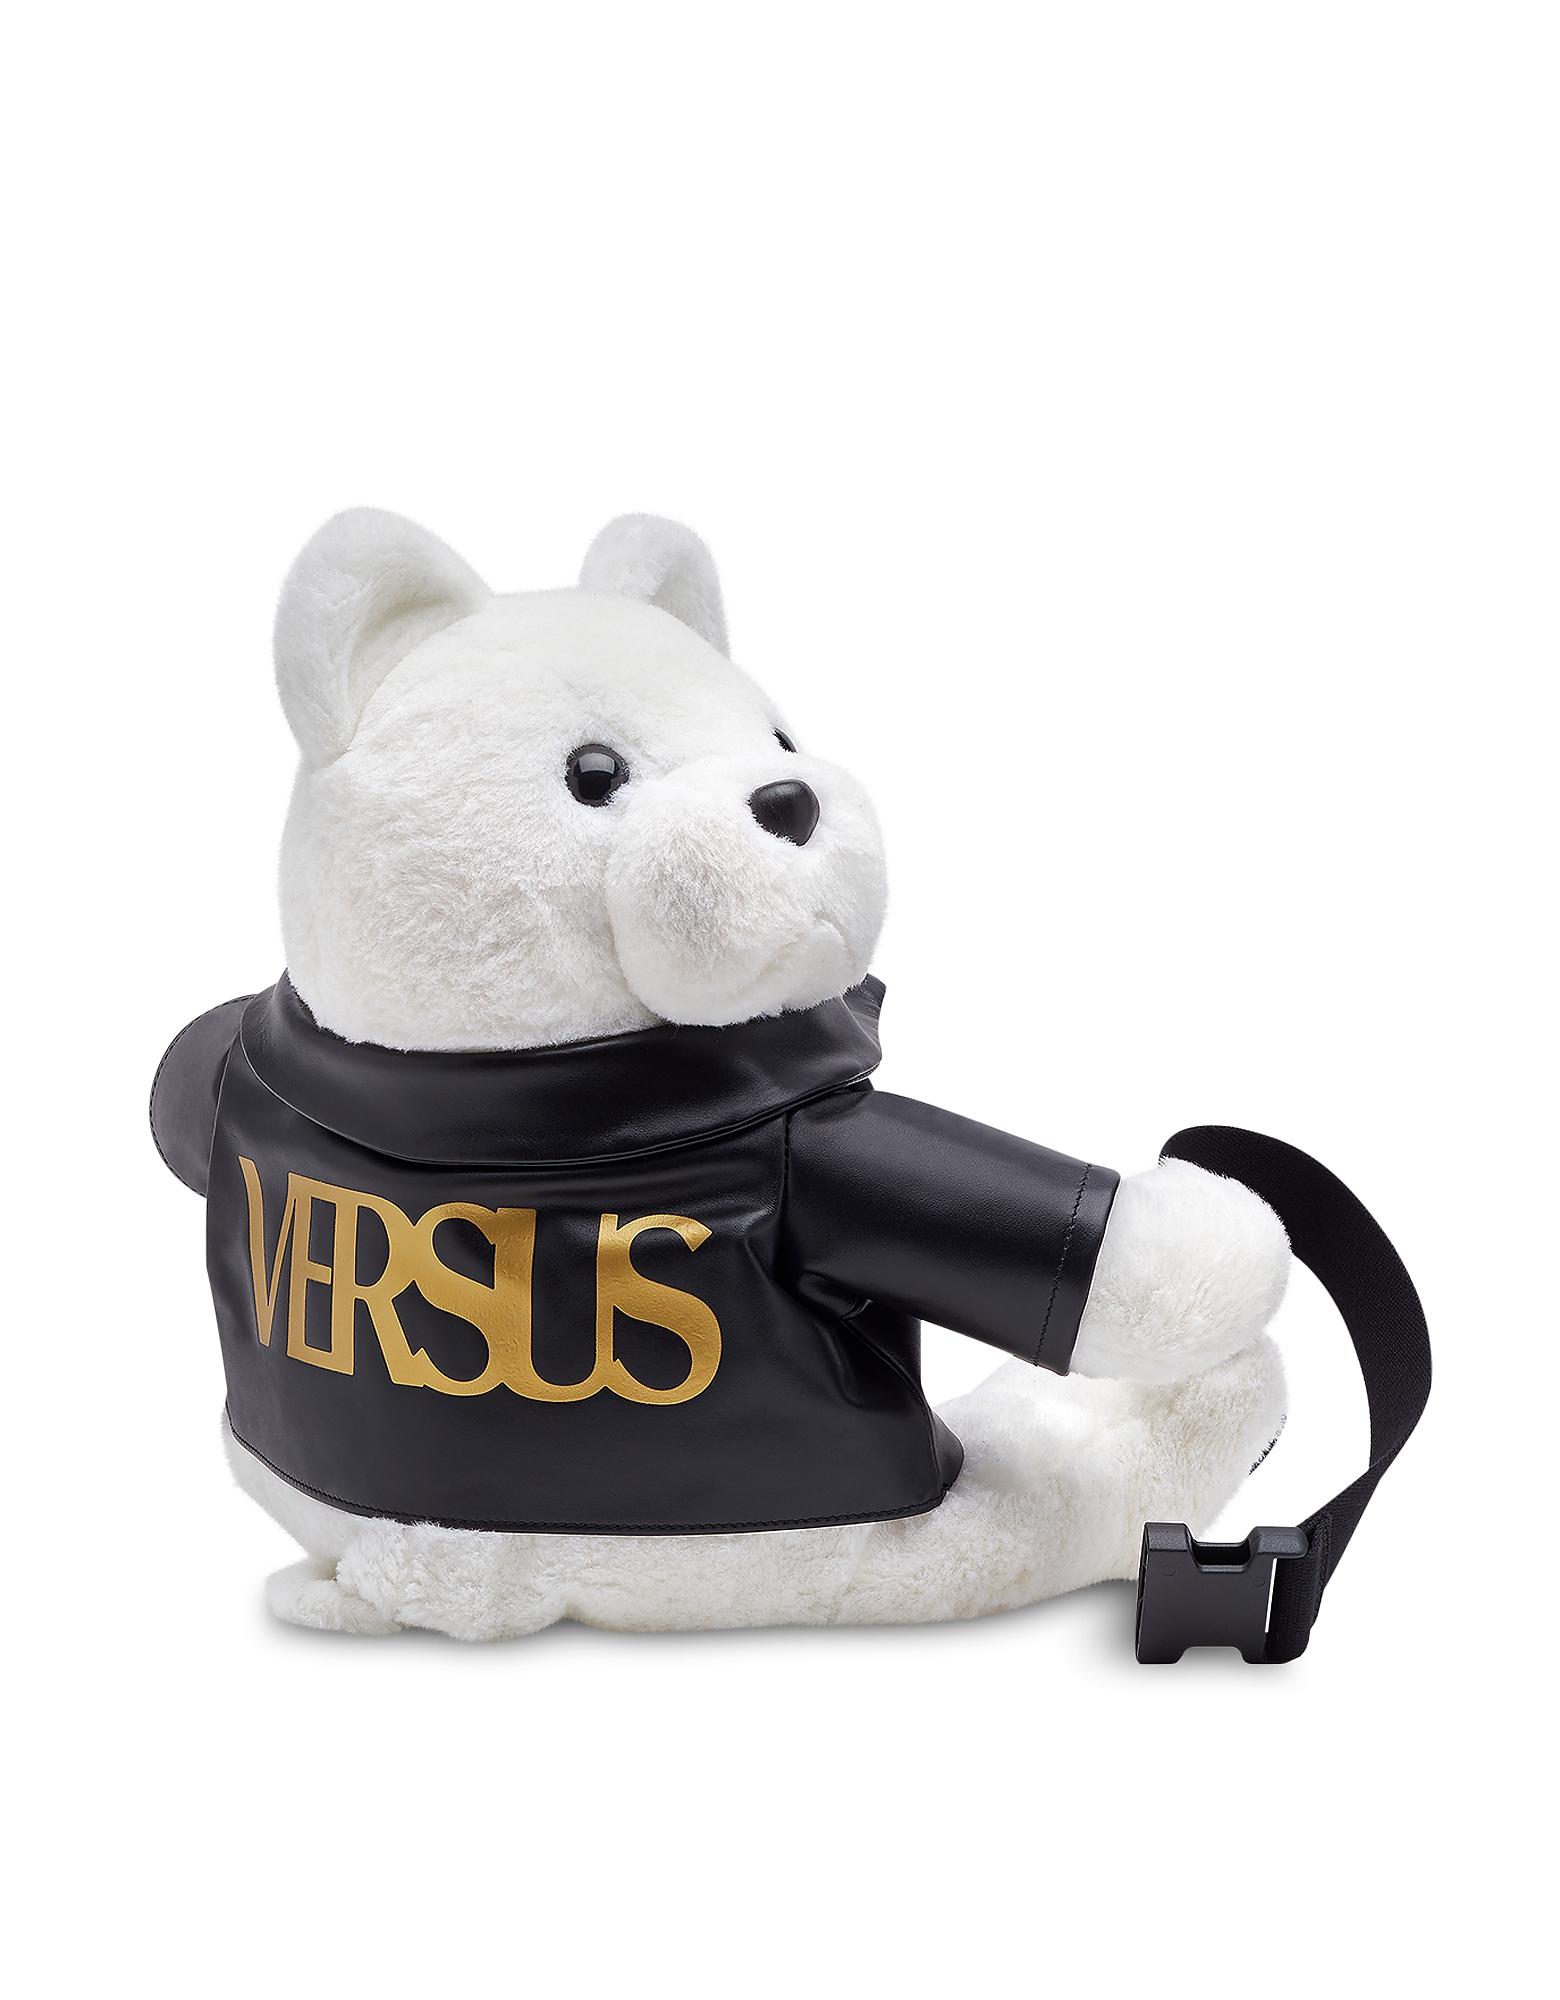 Image of Versace Versus Designer Handbags, White Faux Fur Versus Polar Bear Backpack